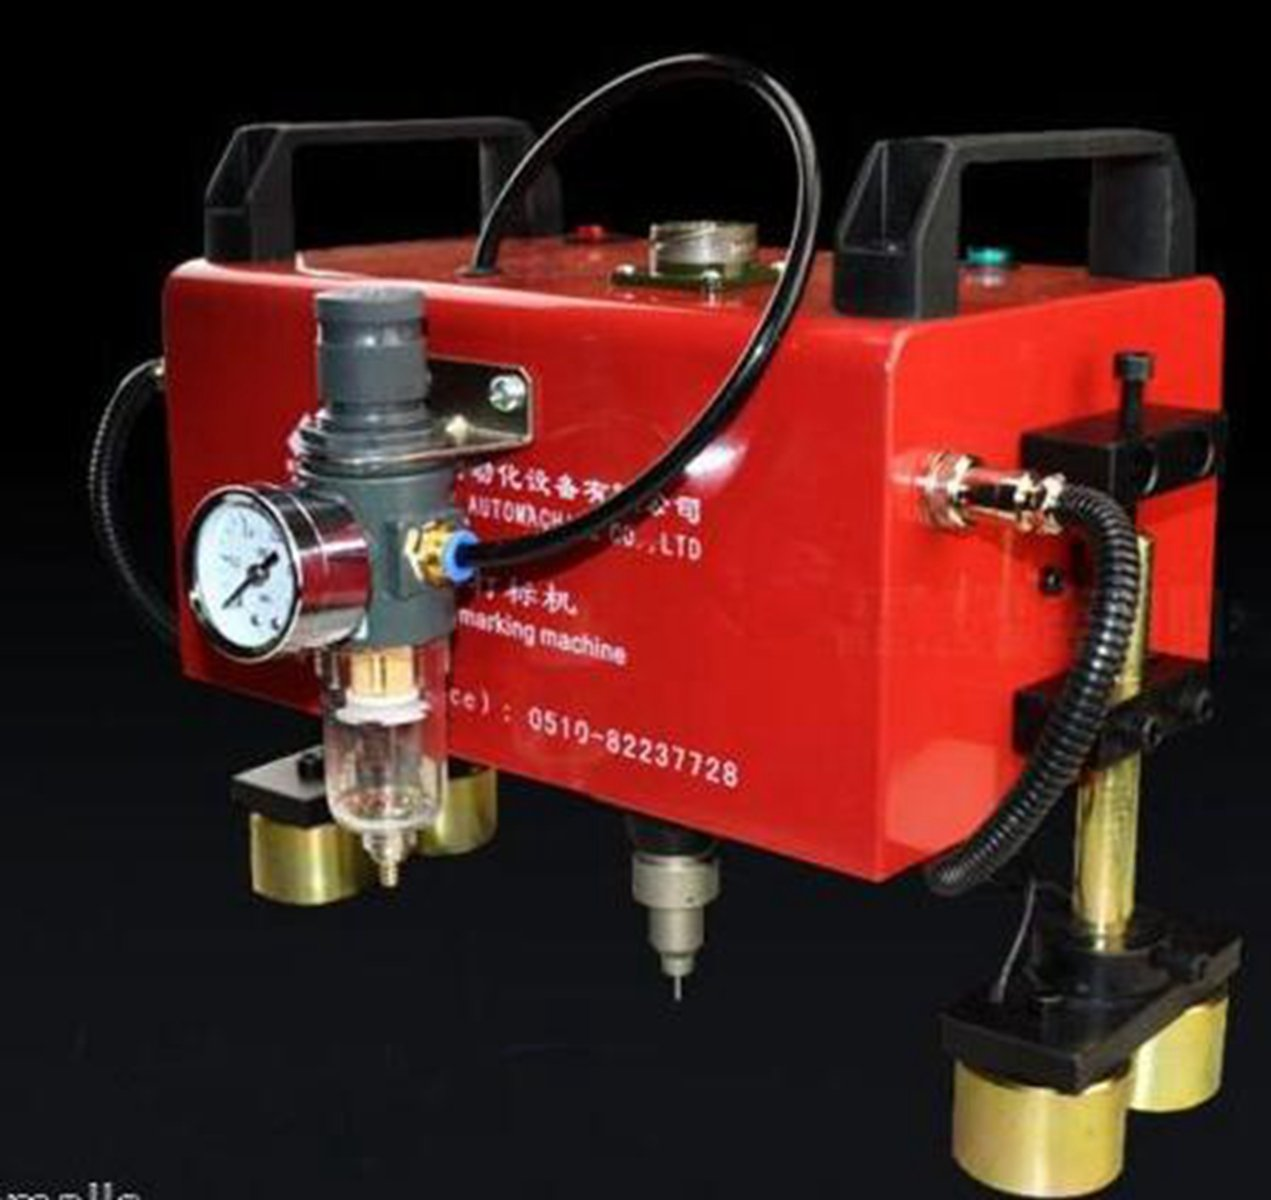 Welljoin Portable Metal Marking Pneumatic Dot Peen Marking Machine 15050mm